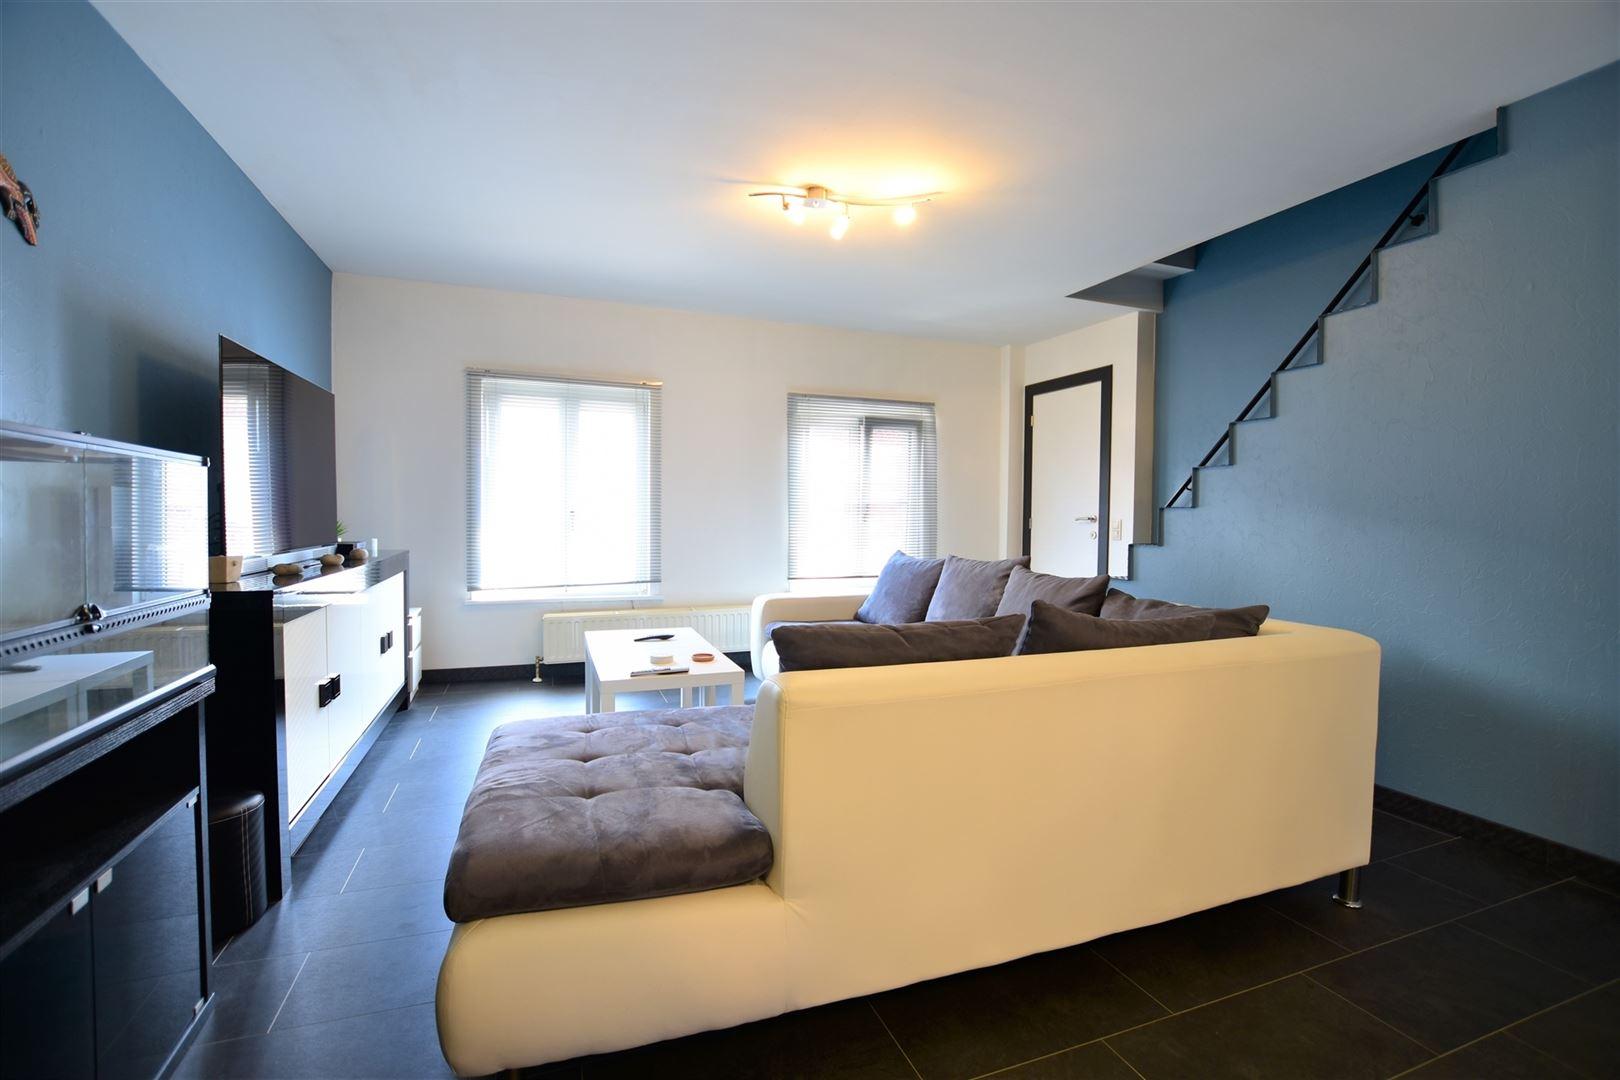 Foto 3 : Duplex/triplex te 9200 BAASRODE (België) - Prijs € 159.000